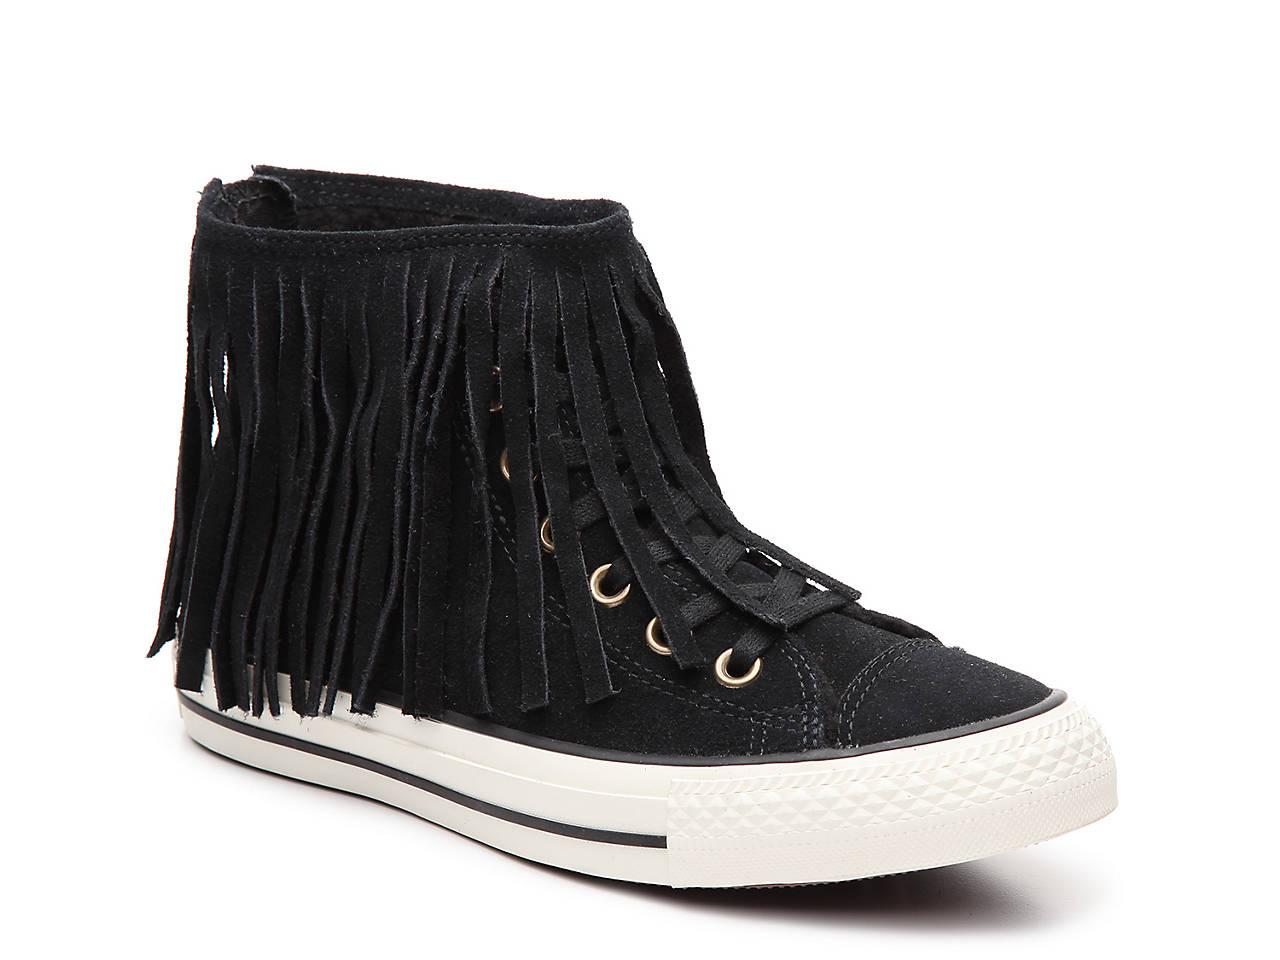 bbefa36fdd98aa Converse Chuck Taylor All Star Fringe High-Top Sneaker - Women s ...